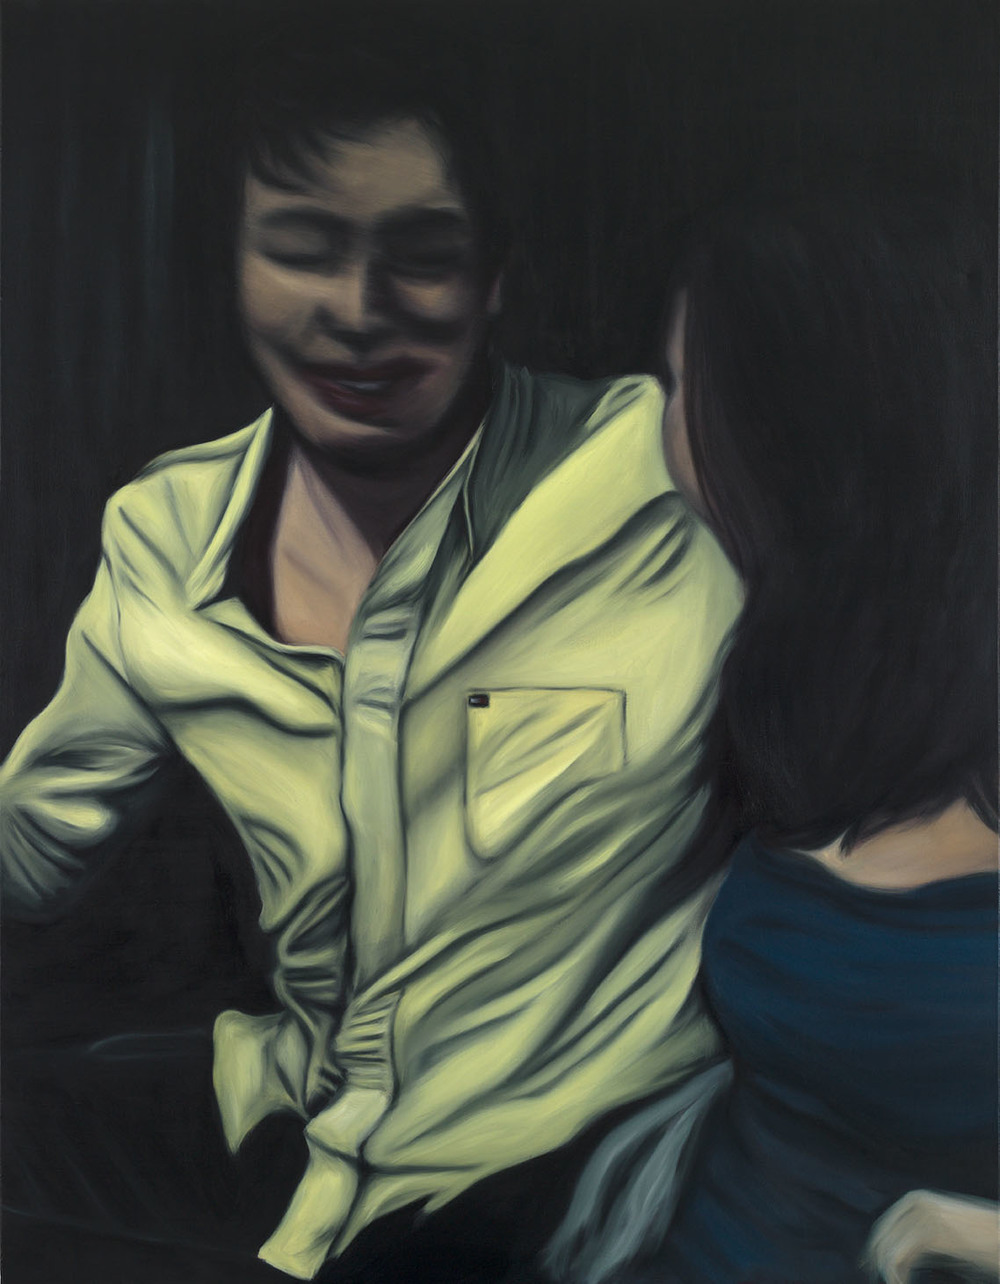 Cabrera 84, Bogotá 2014    2015  Óleo y acrílico sobre lienzo  150 x 100 cms